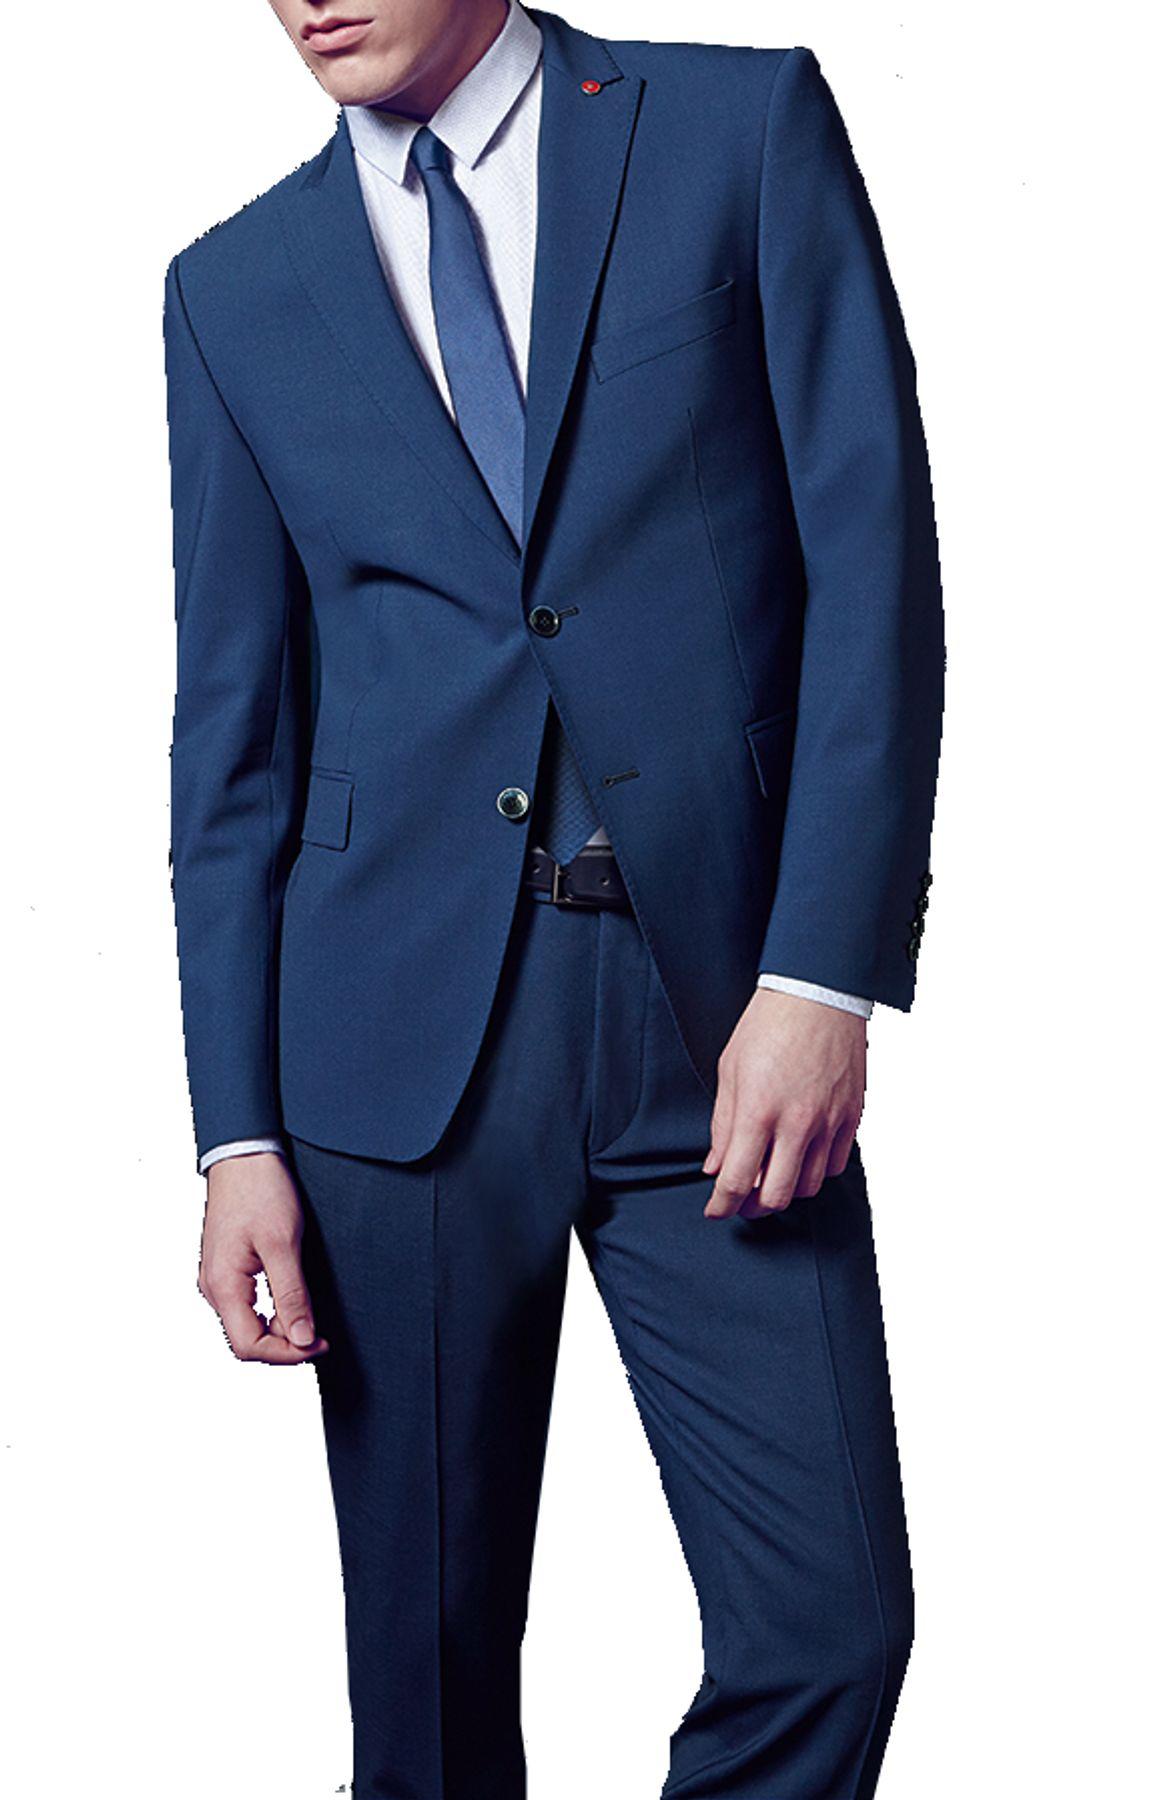 Atelier Torino GALA - Modern Fit - Herren Baukasten Anzug in Blau, Weber: Tollegno, Tizian SS/Caio (861153) – Bild 2